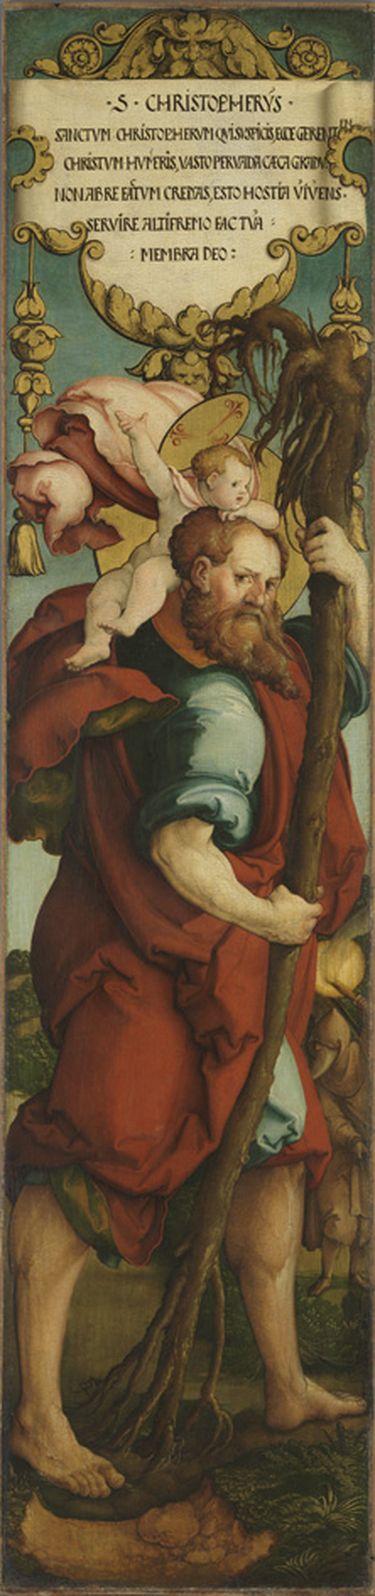 Hl. Christophorus Rückseite: Kandelaberornament